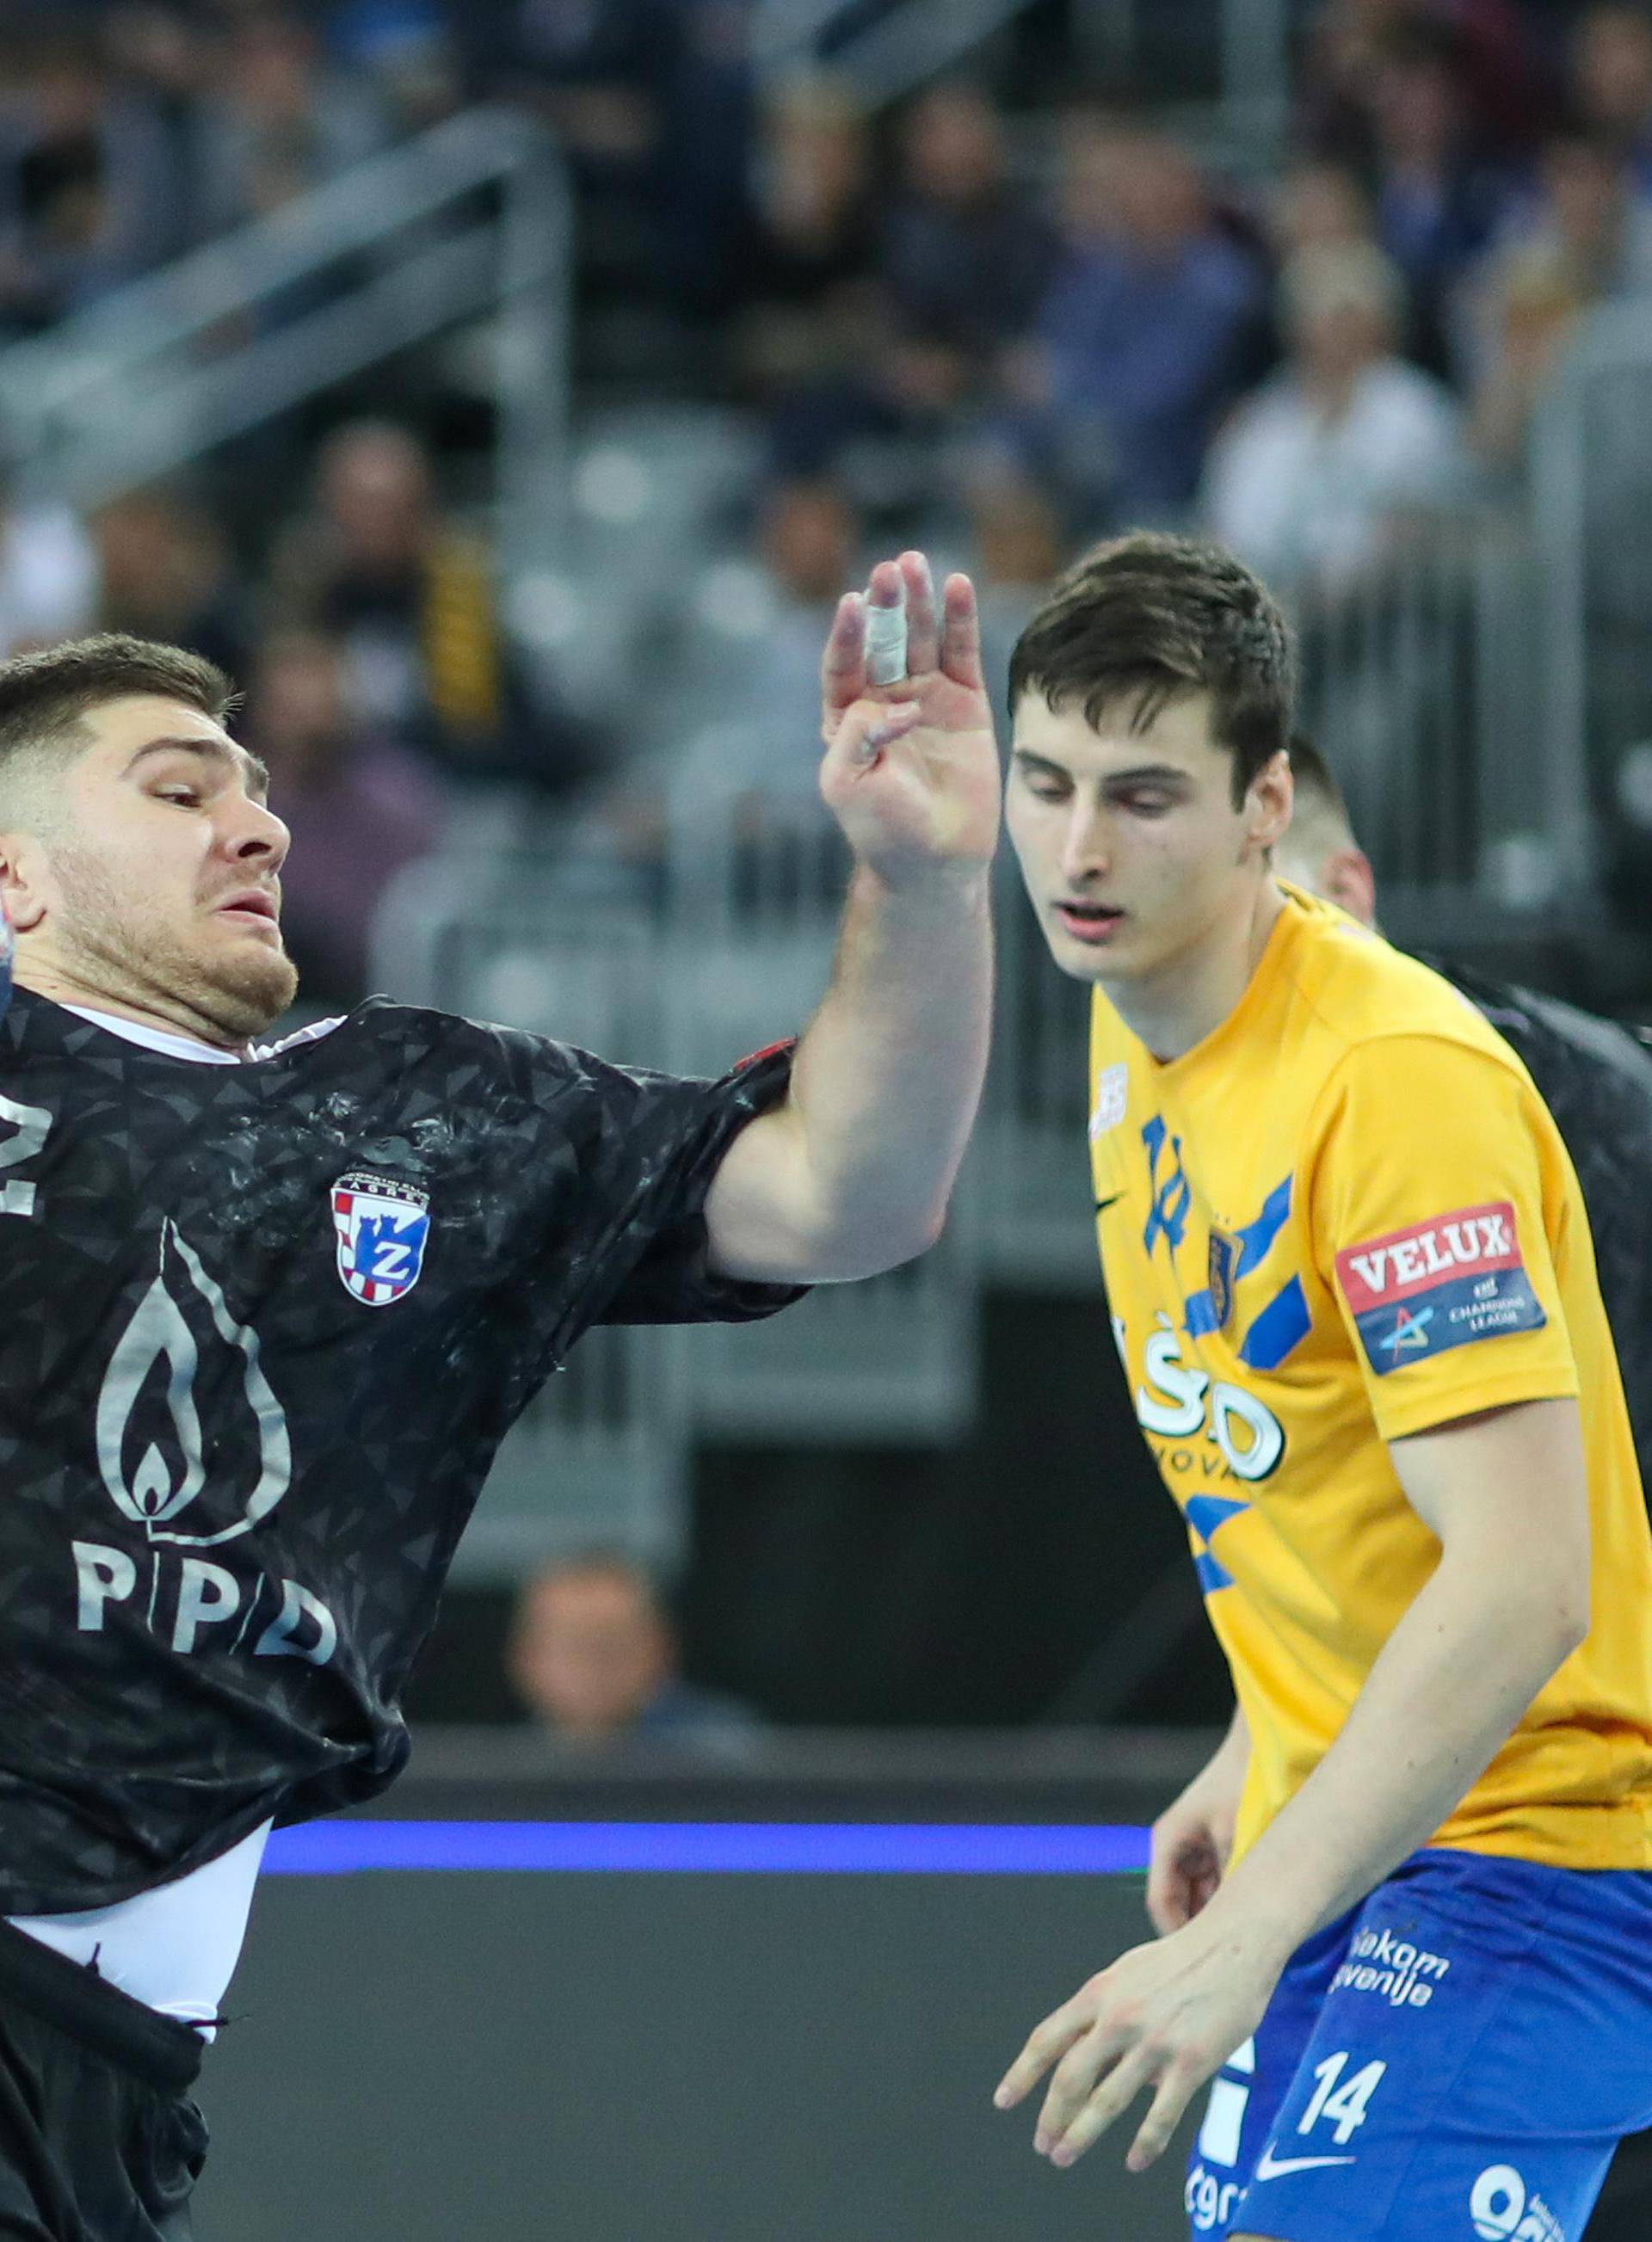 PPD Zagreb i RK Celje Pivovara Laško sastali se u 8. kolu EHF Lige prvaka